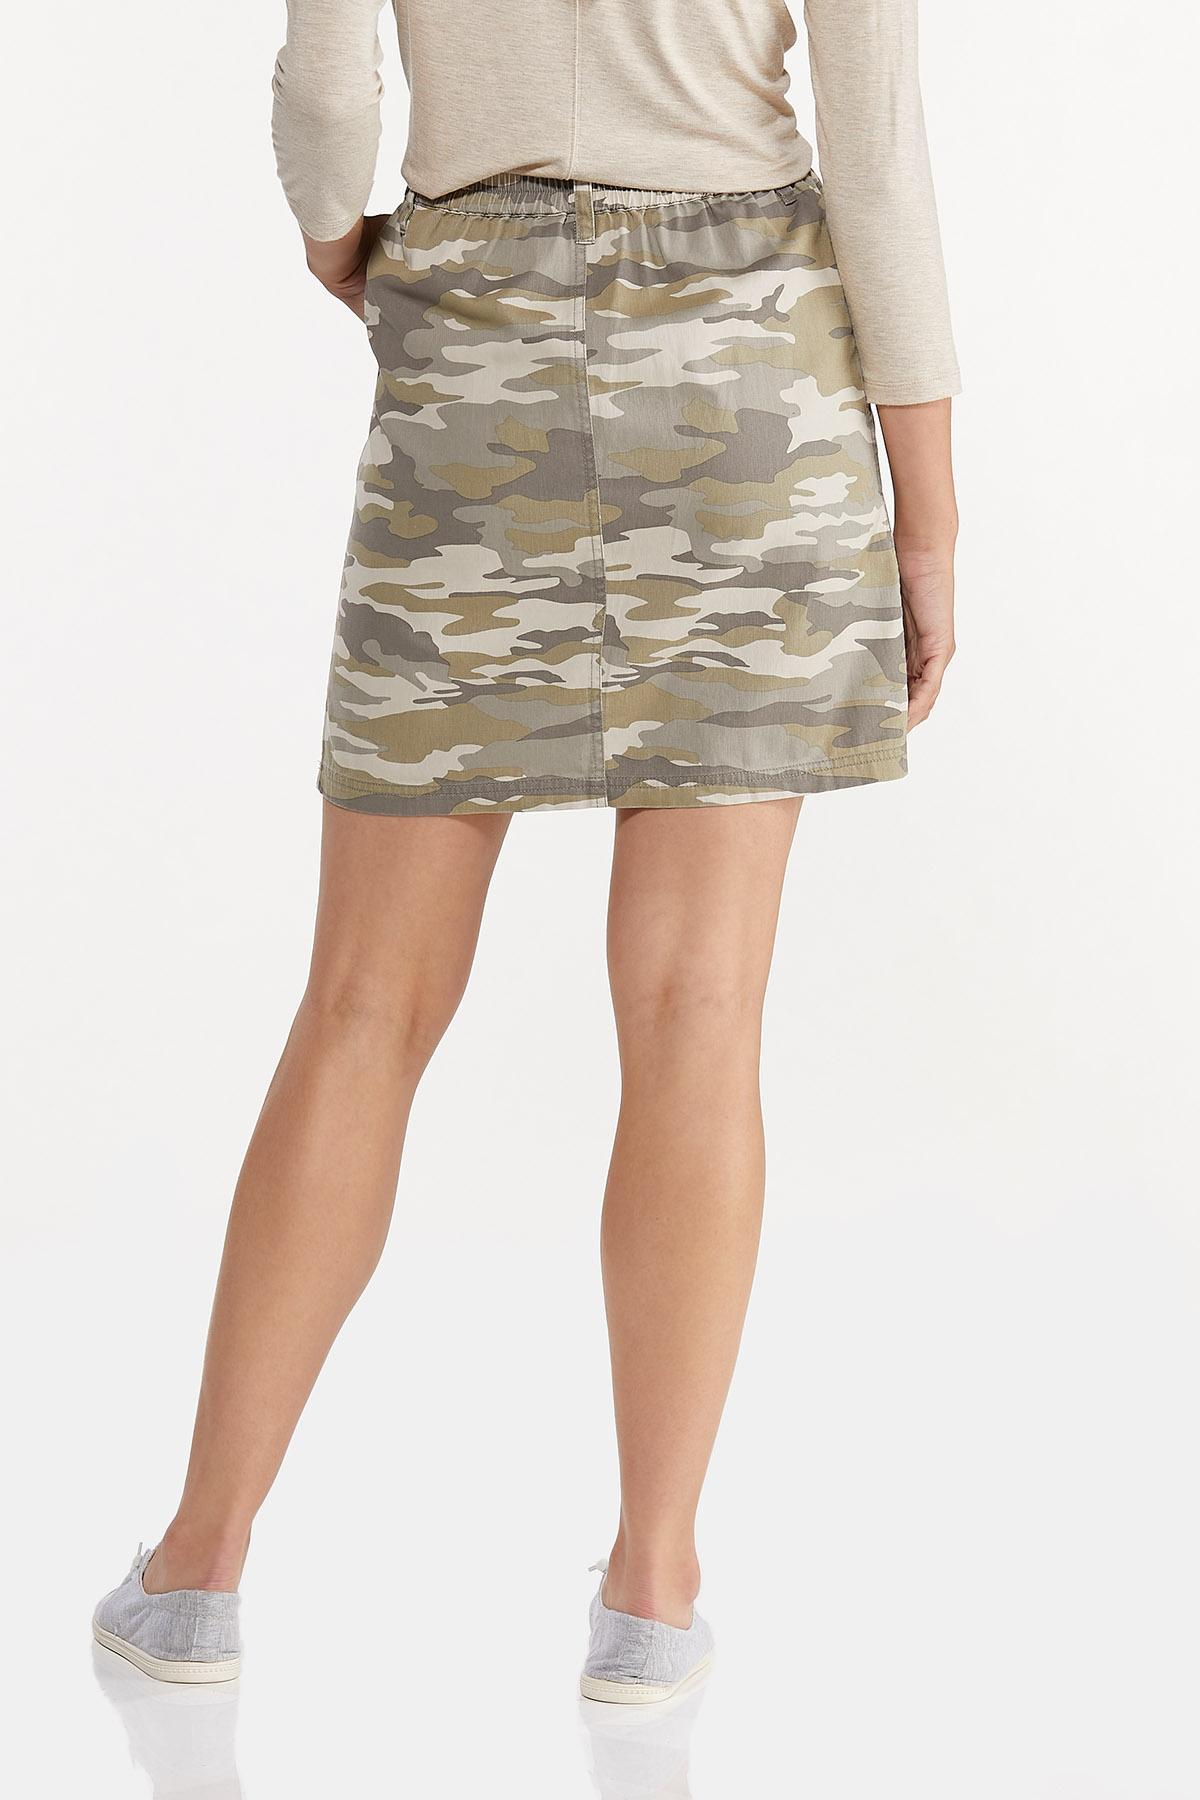 Camo Mini Skirt (Item #44643144)